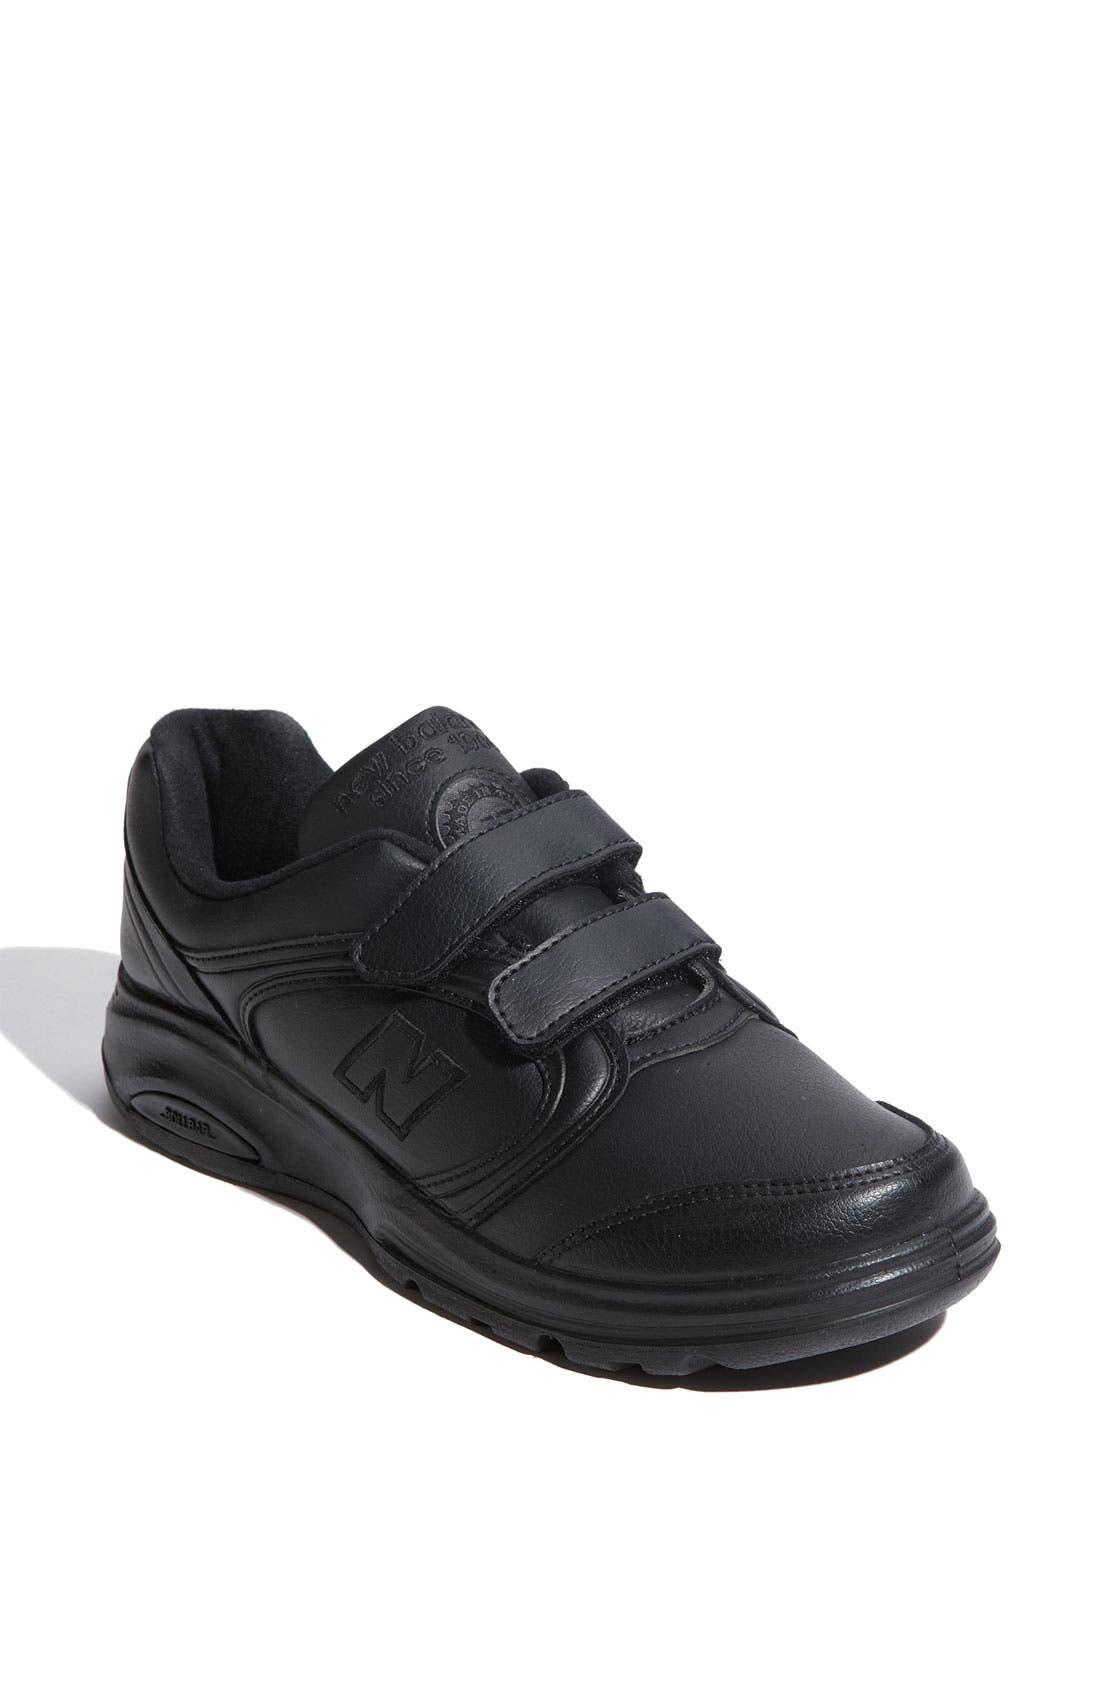 Alternate Image 1 Selected - New Balance '812' Walking Shoe (Women)